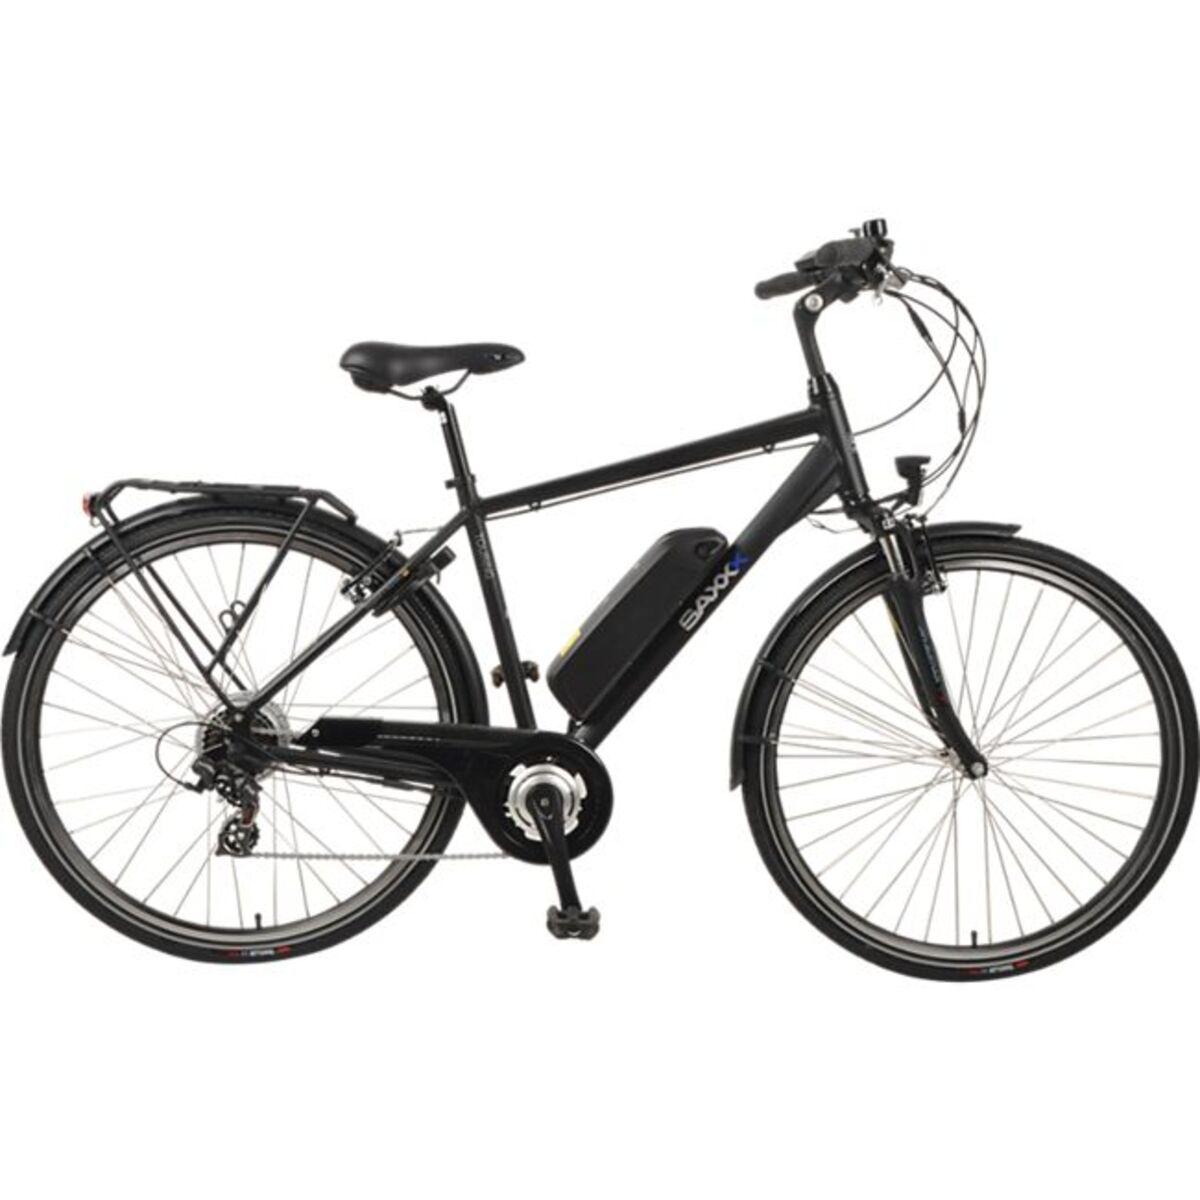 Bild 1 von SAXXX Touring E-Bike schwarz matt